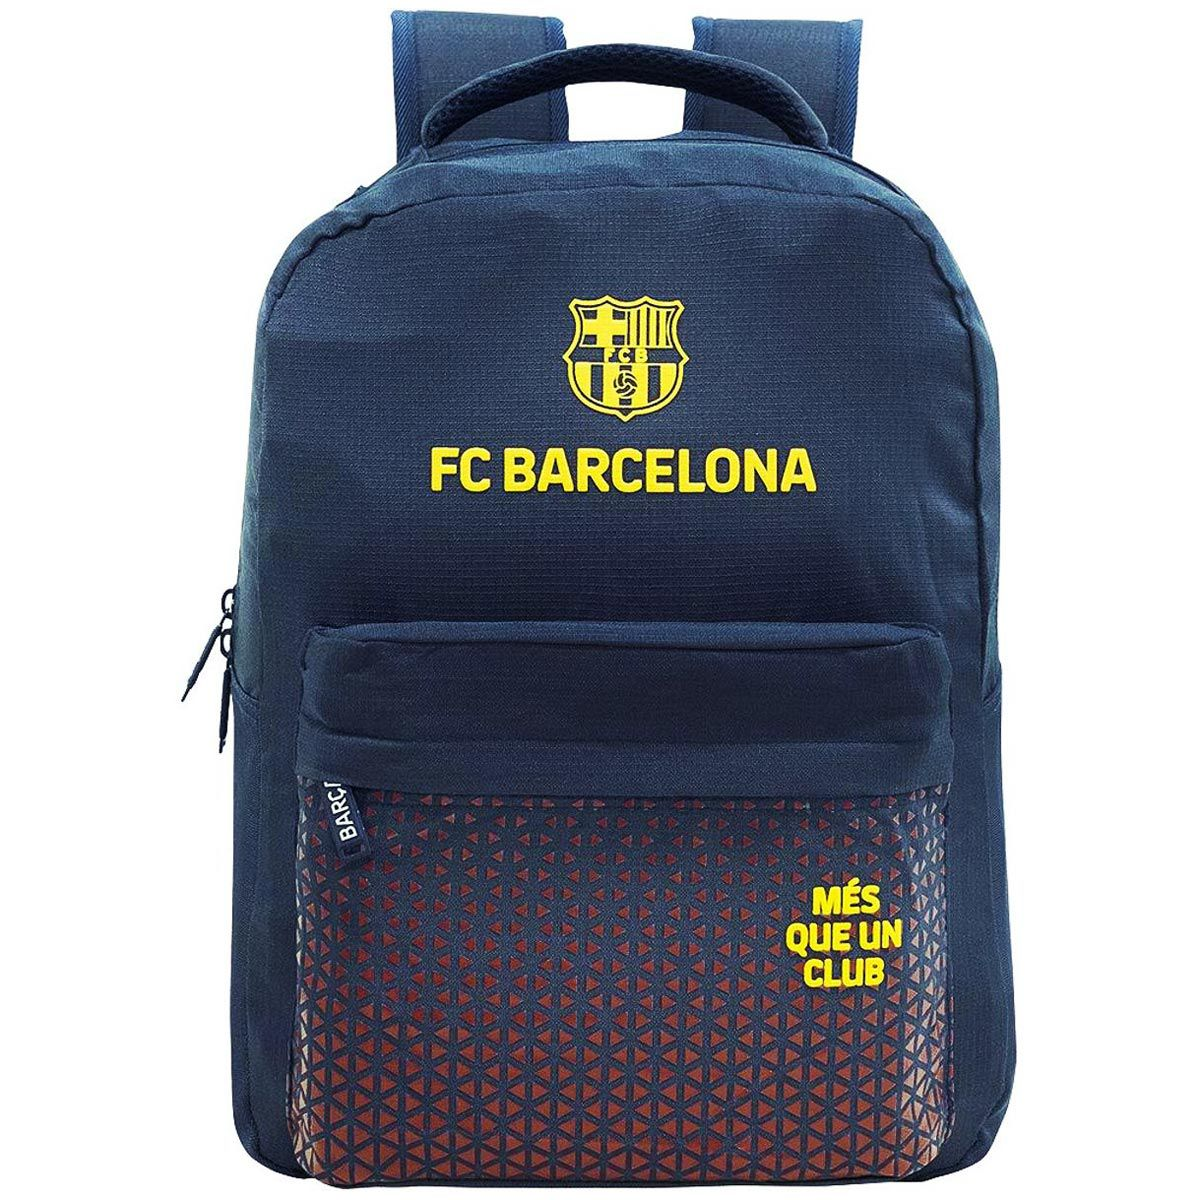 Mochila do Barcelona Xeryus 9157